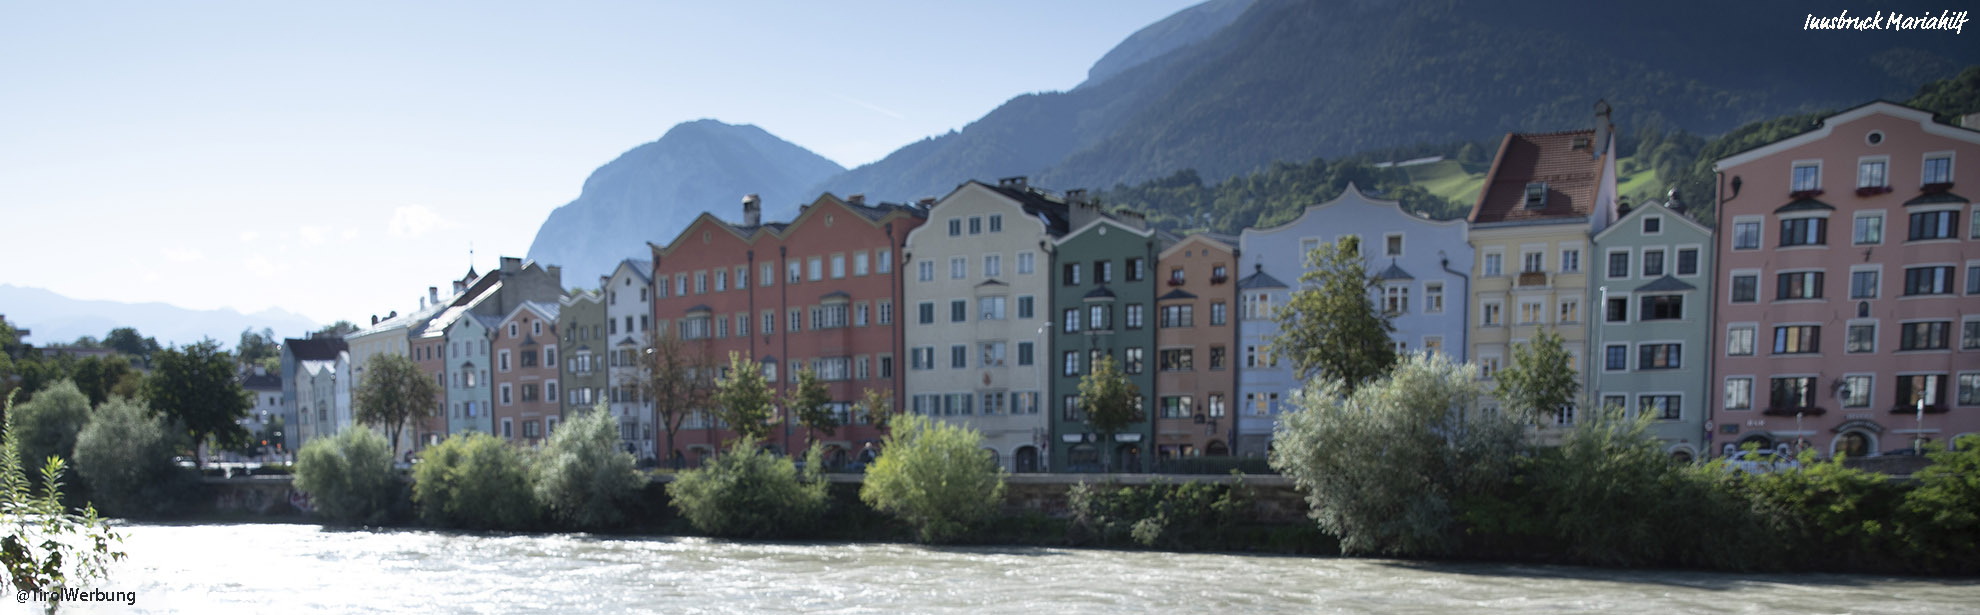 OTirolWerbung_Innsbruck-Mariahilf_1226590